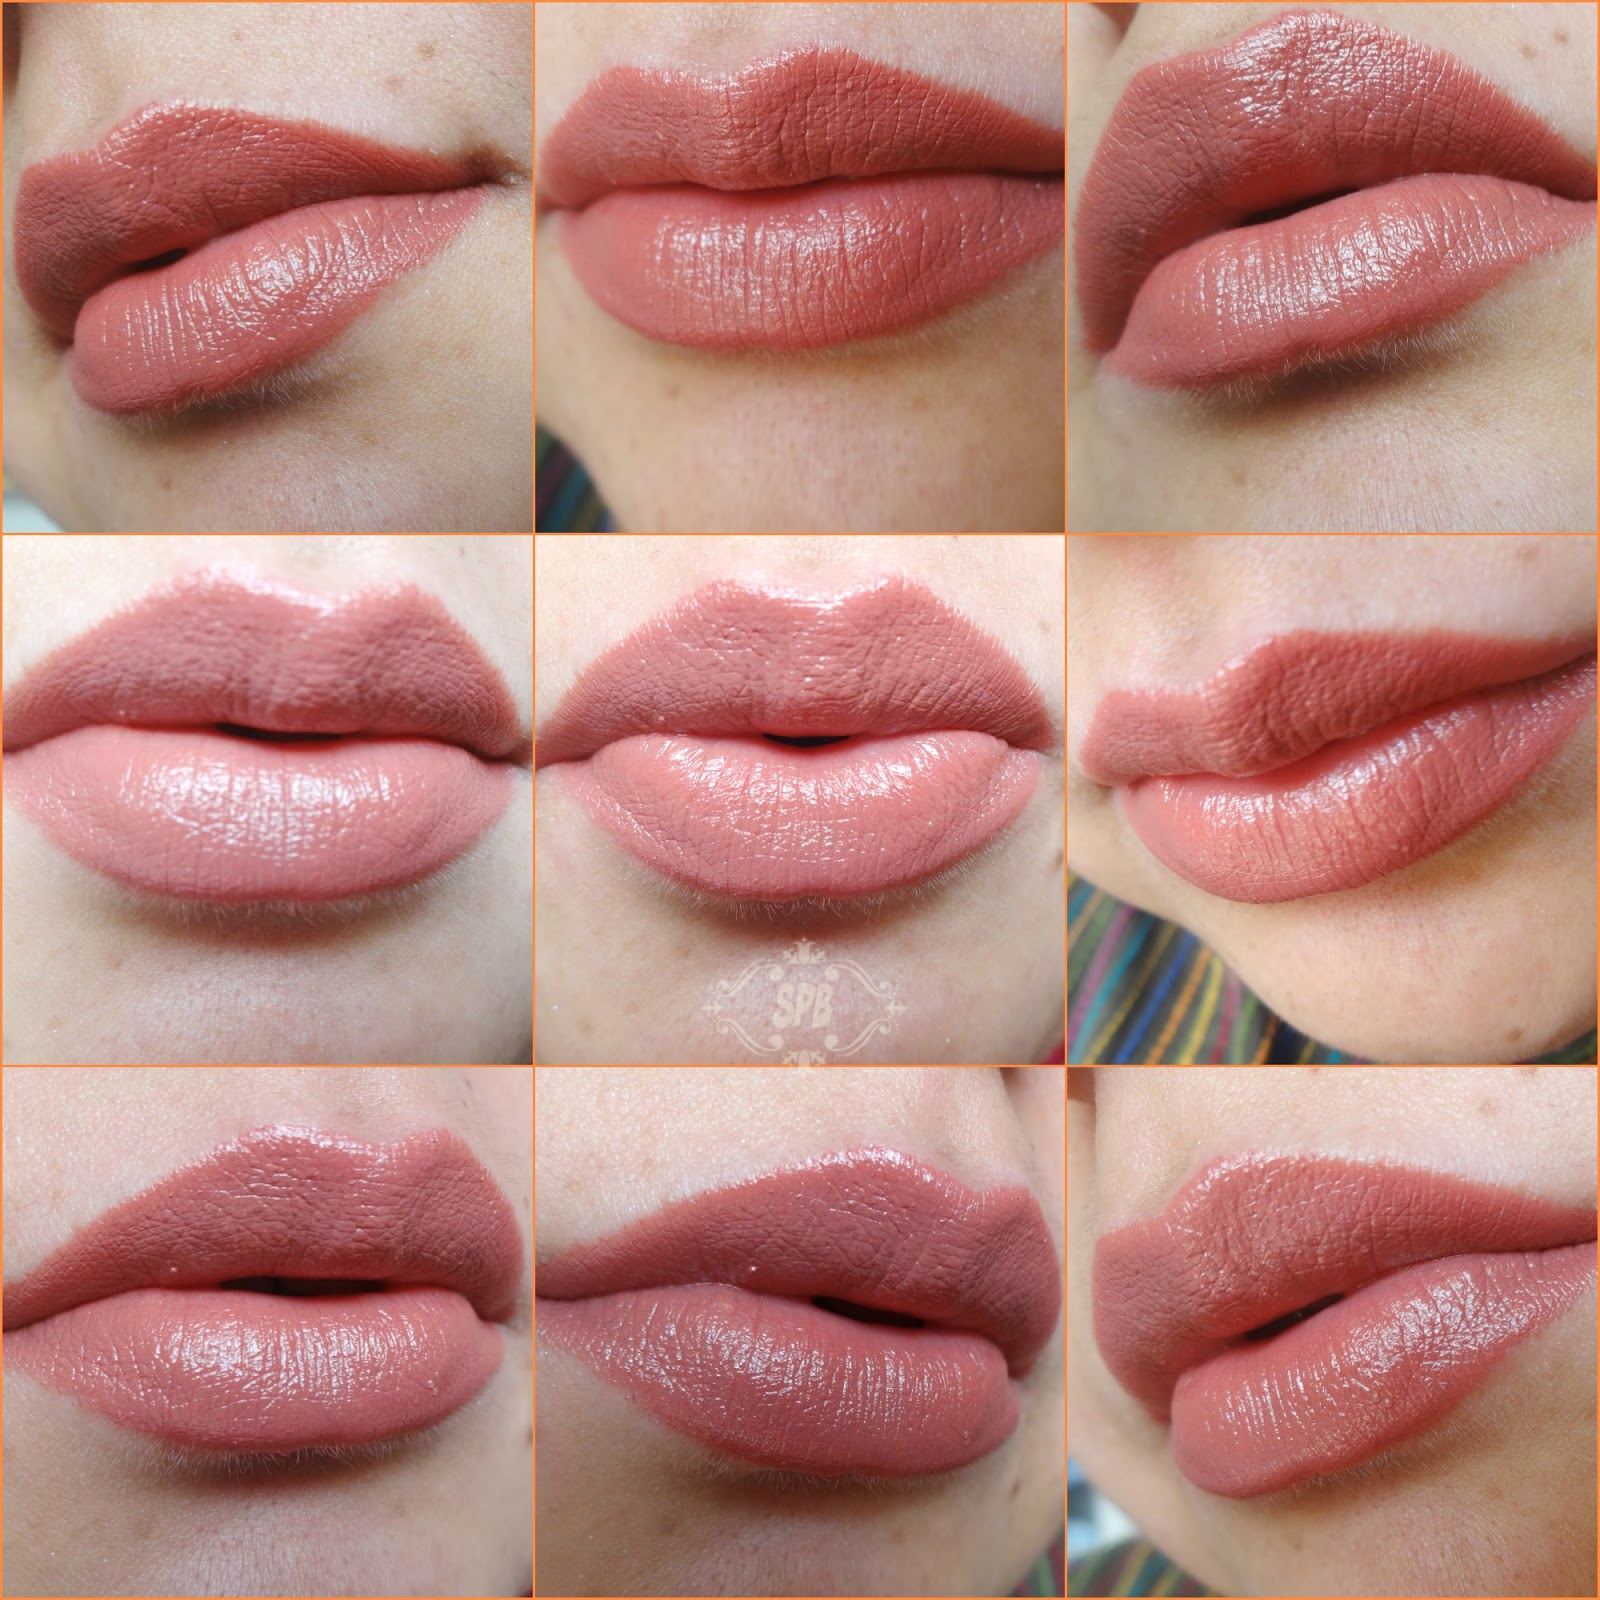 Milani Statement Lipstick and Baked Blush | Sparkling Palette Blog